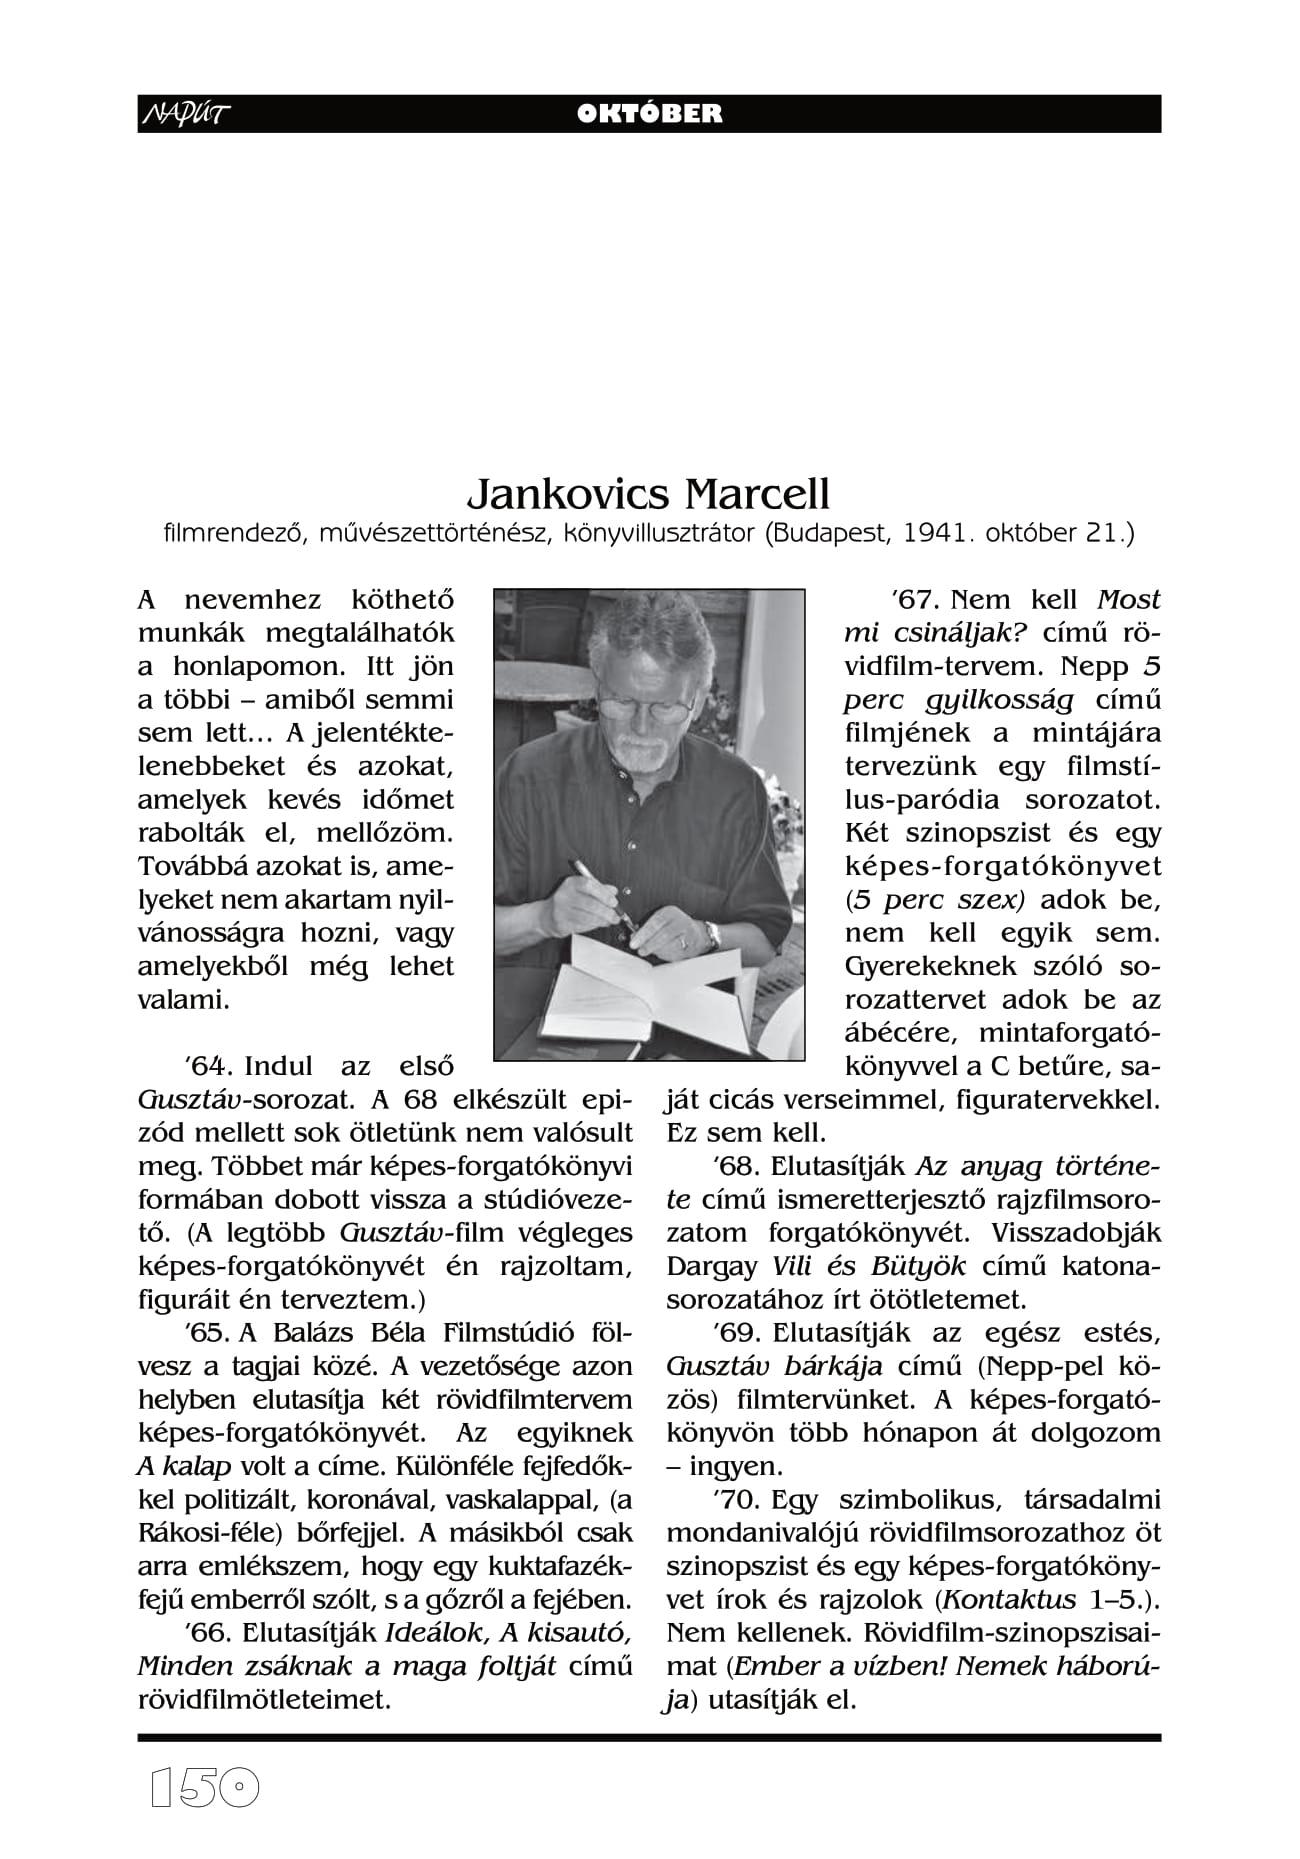 naput120 Jankovics Marcell-1